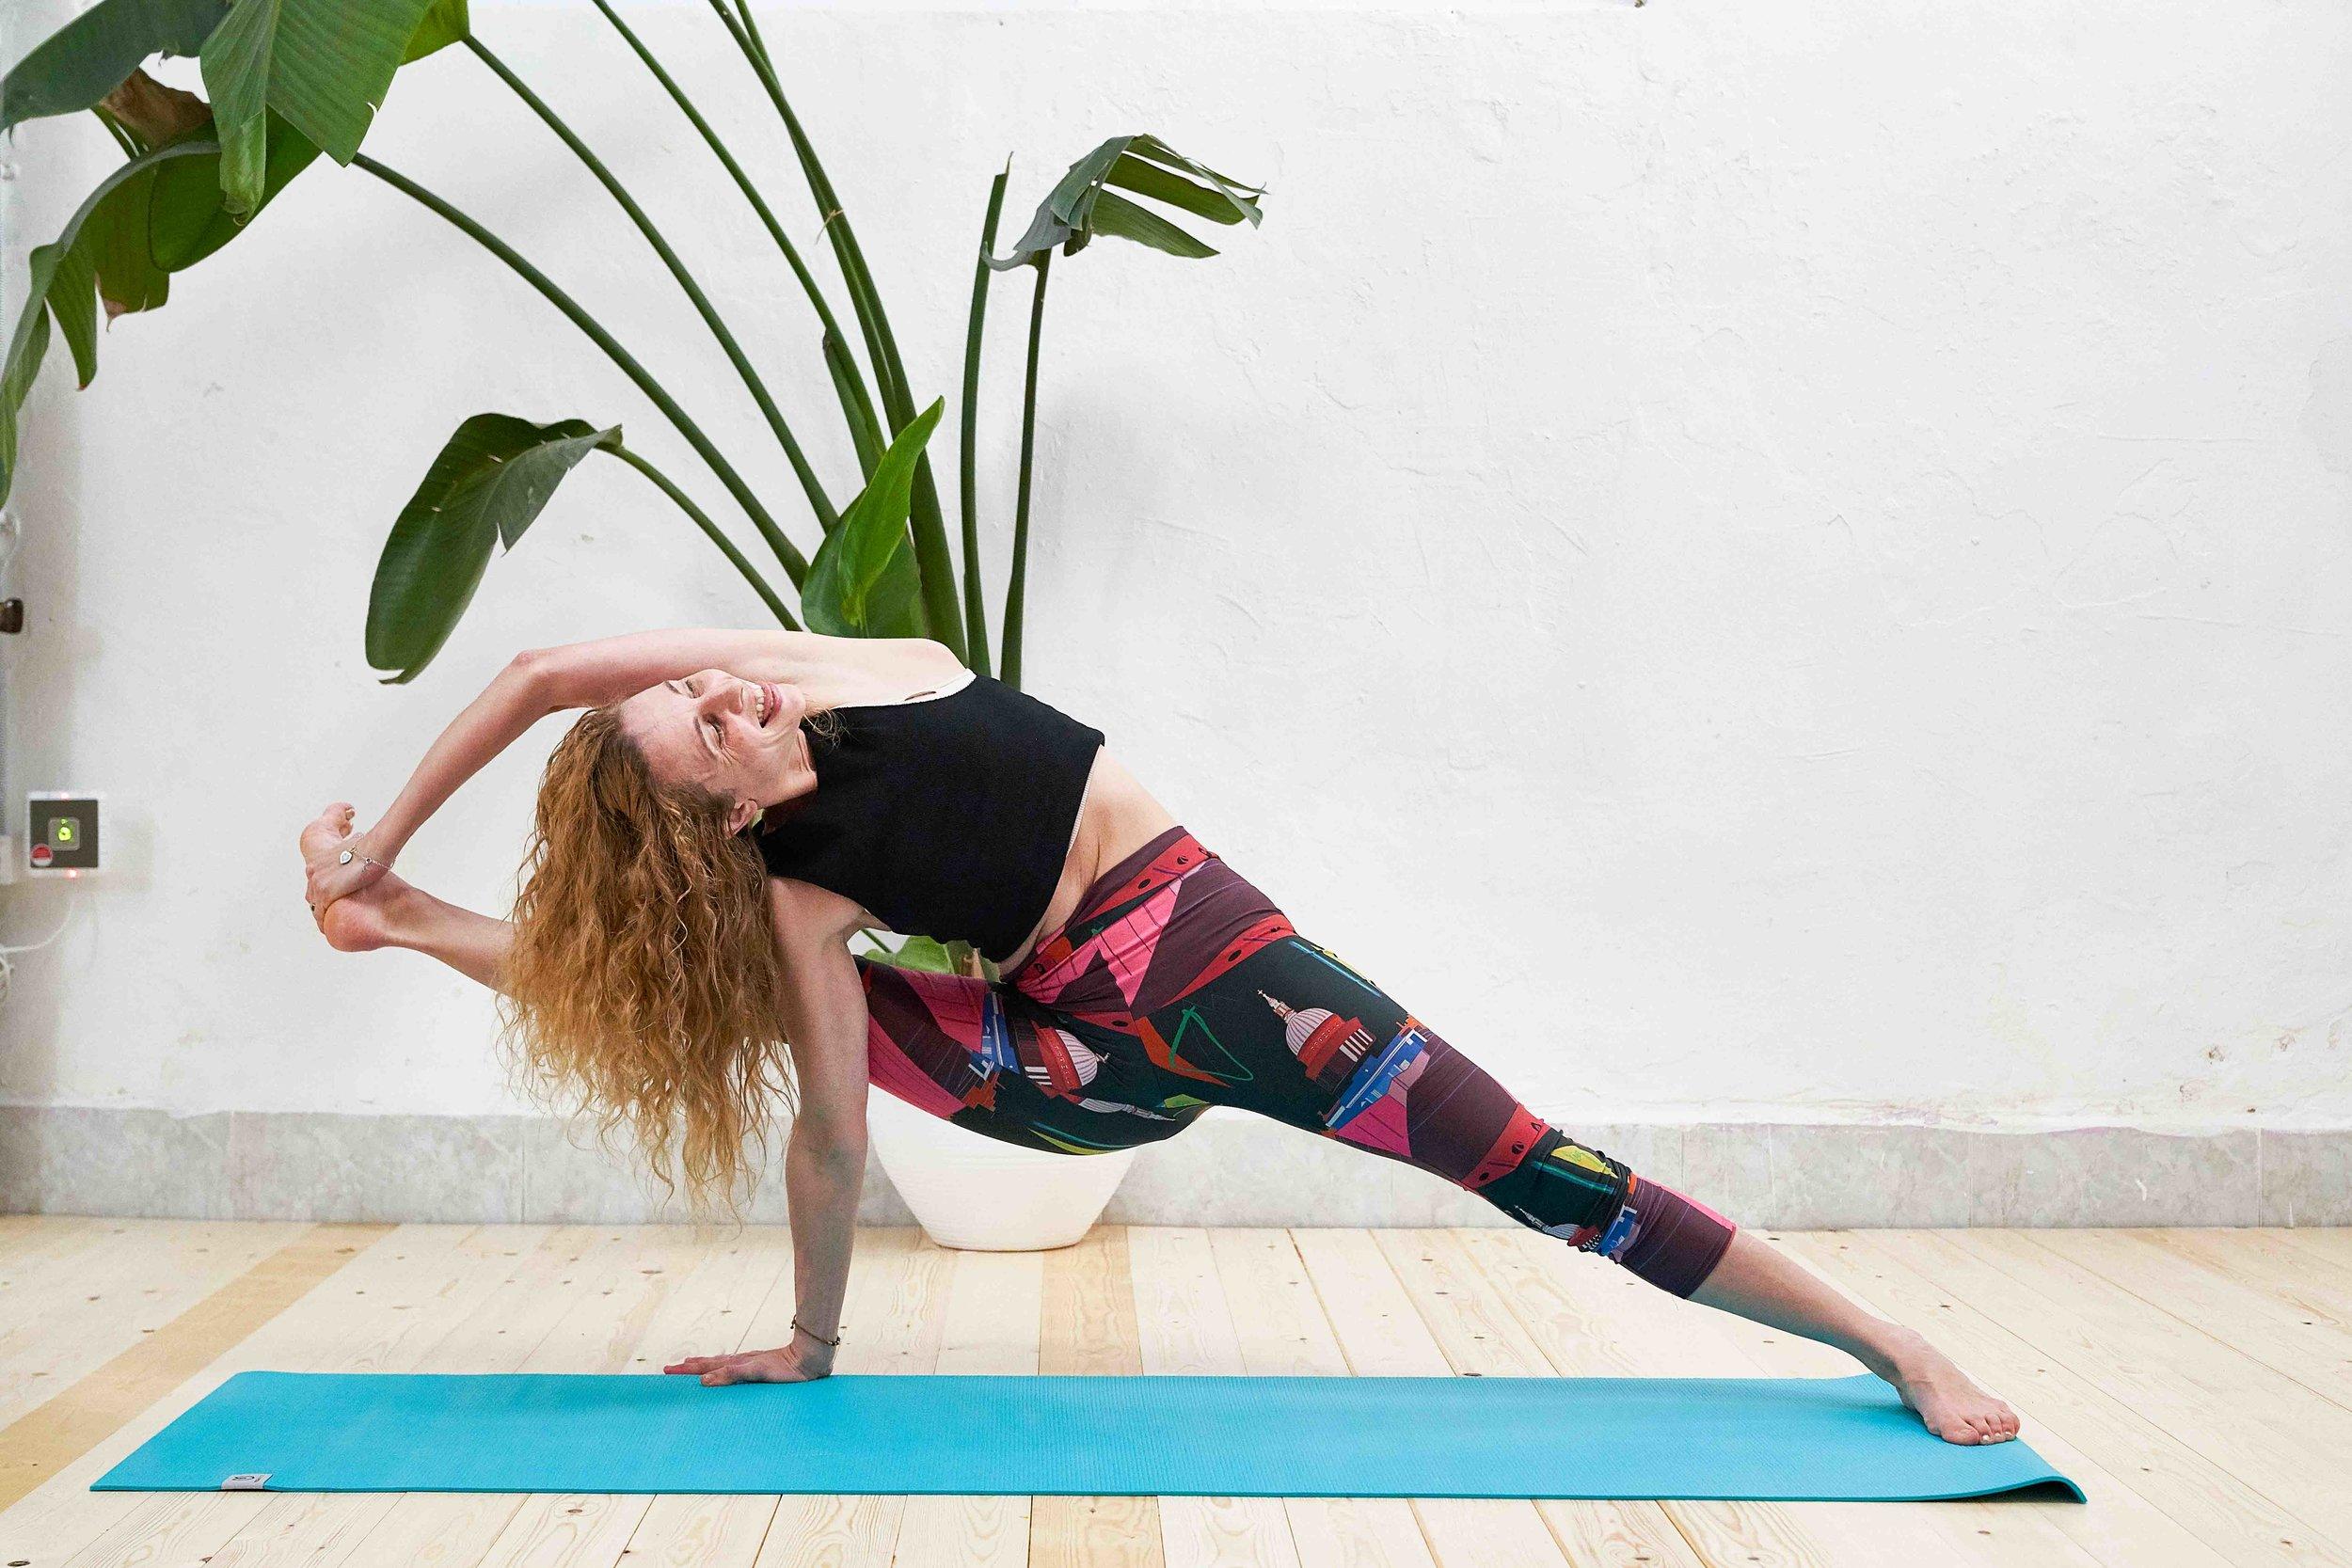 Yoga studio barcelona small (5 of 12).jpg